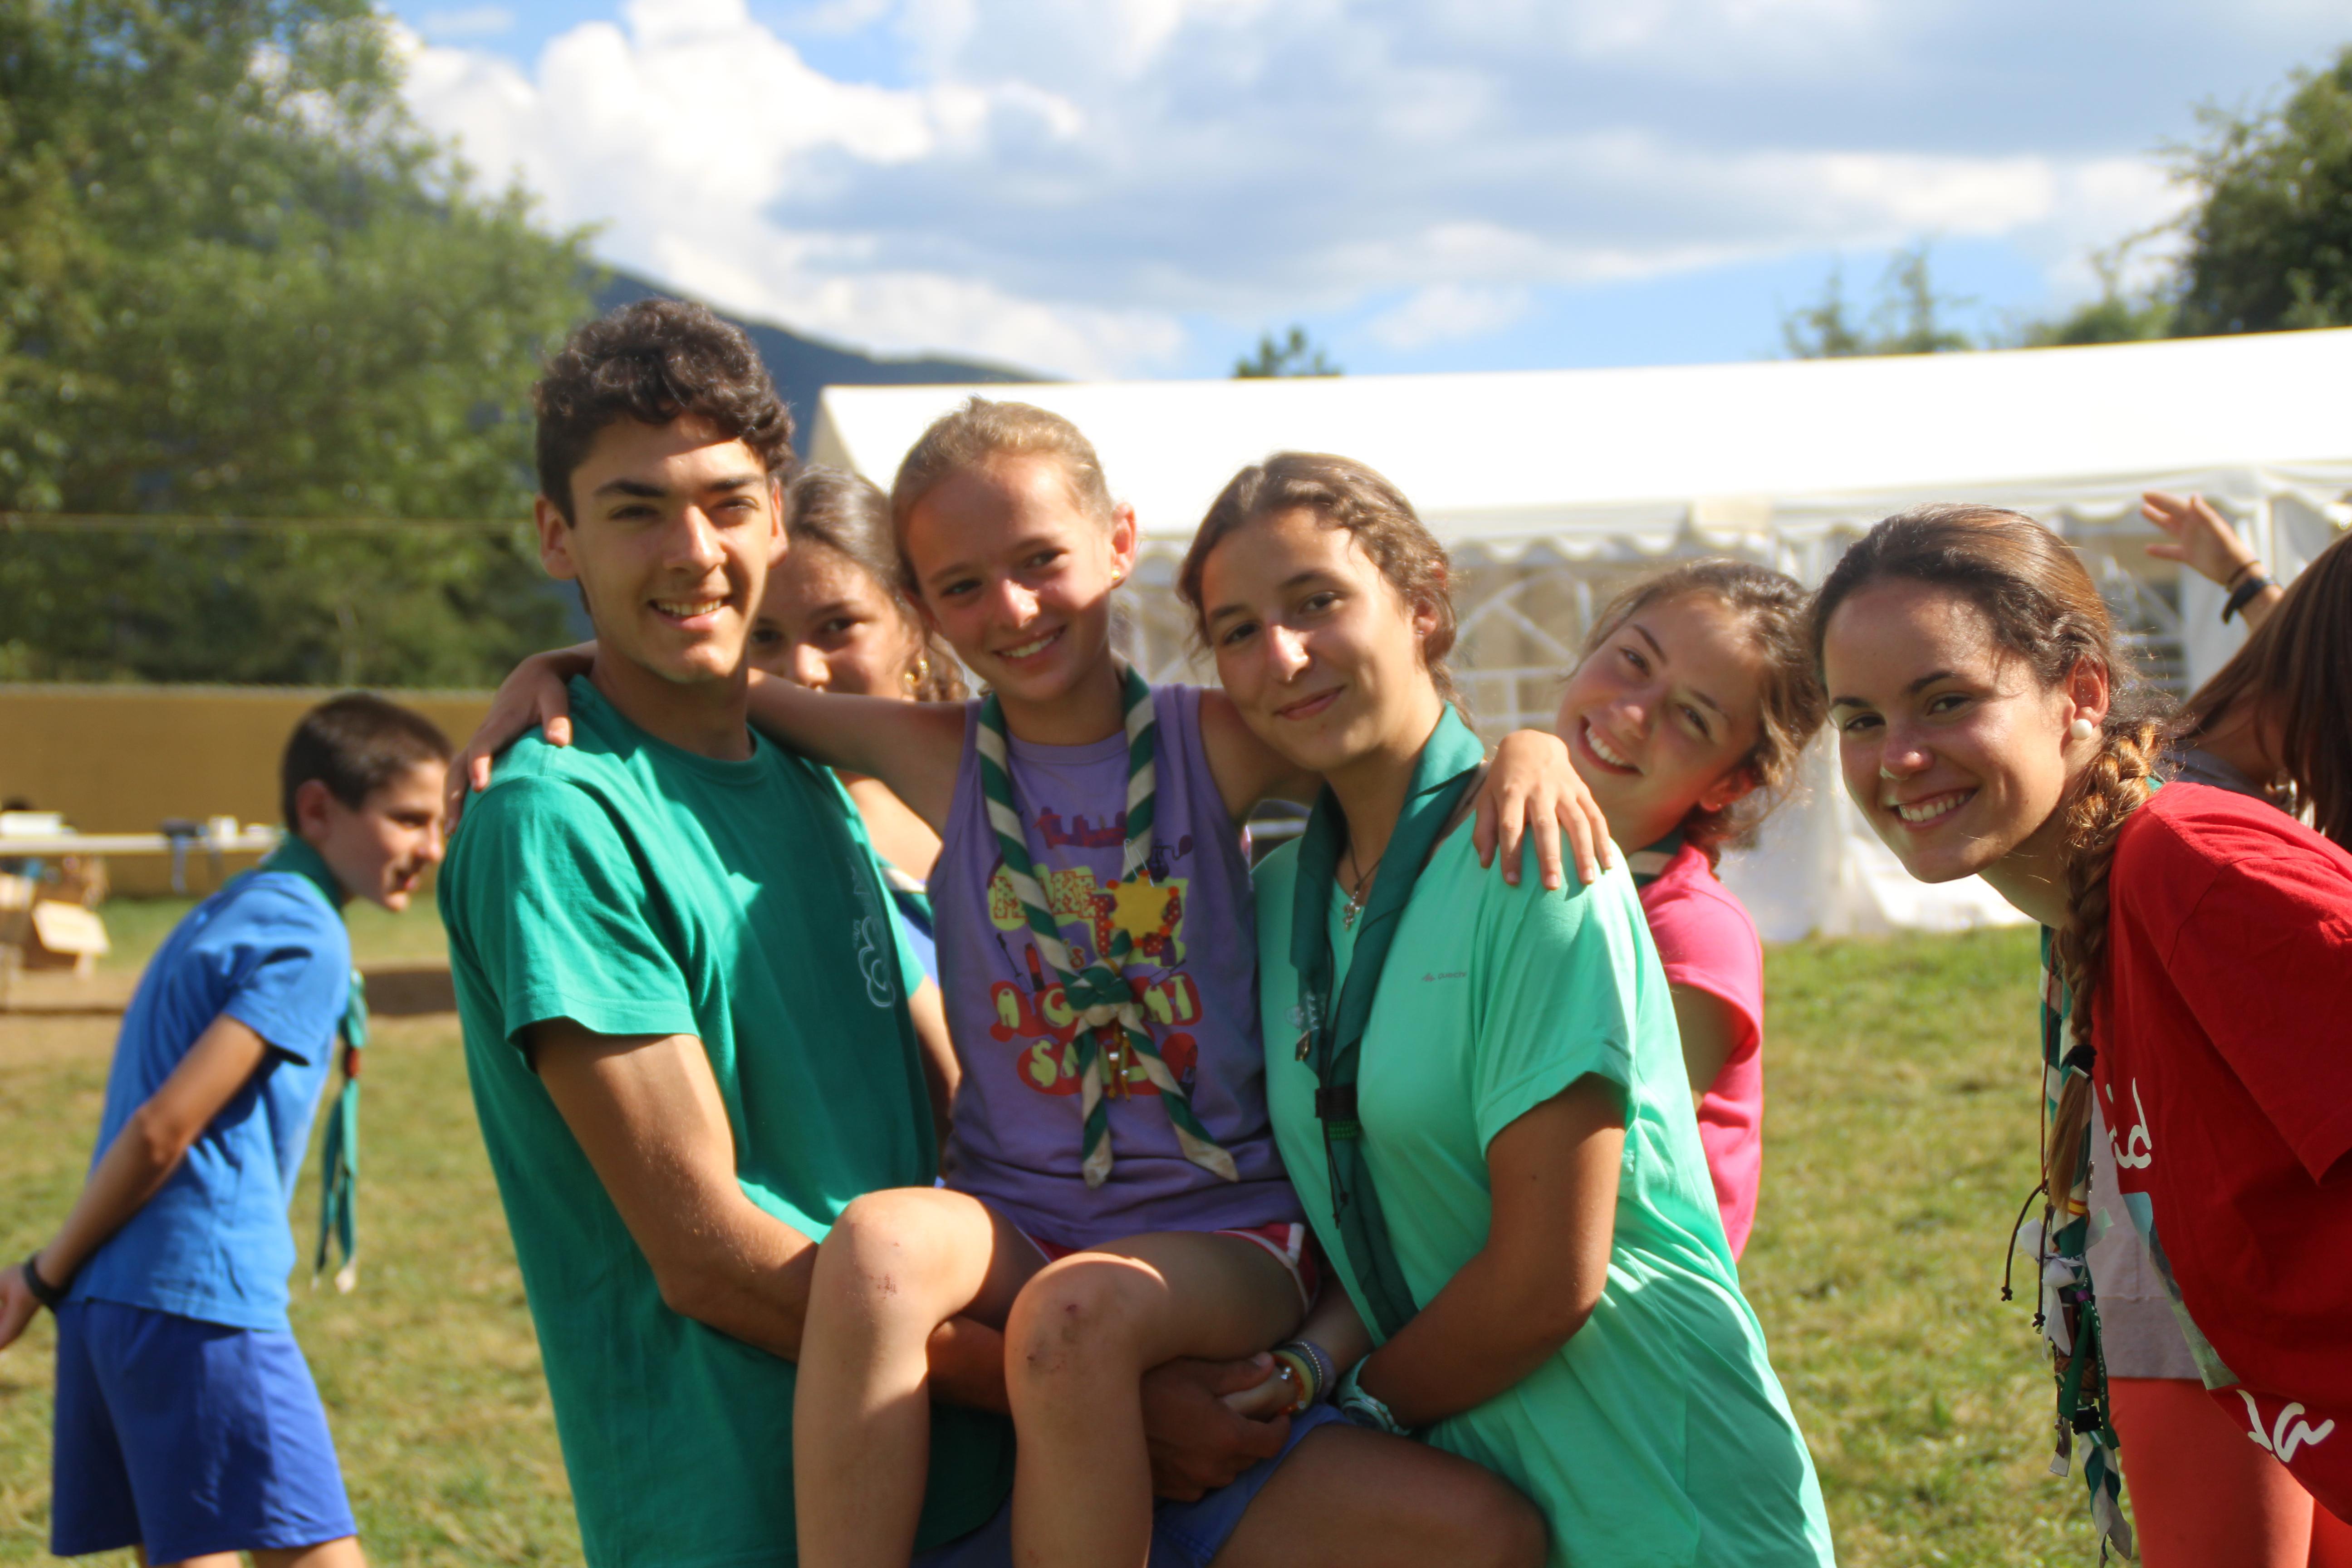 15-16 - Grupo - Campamento de verano - P209